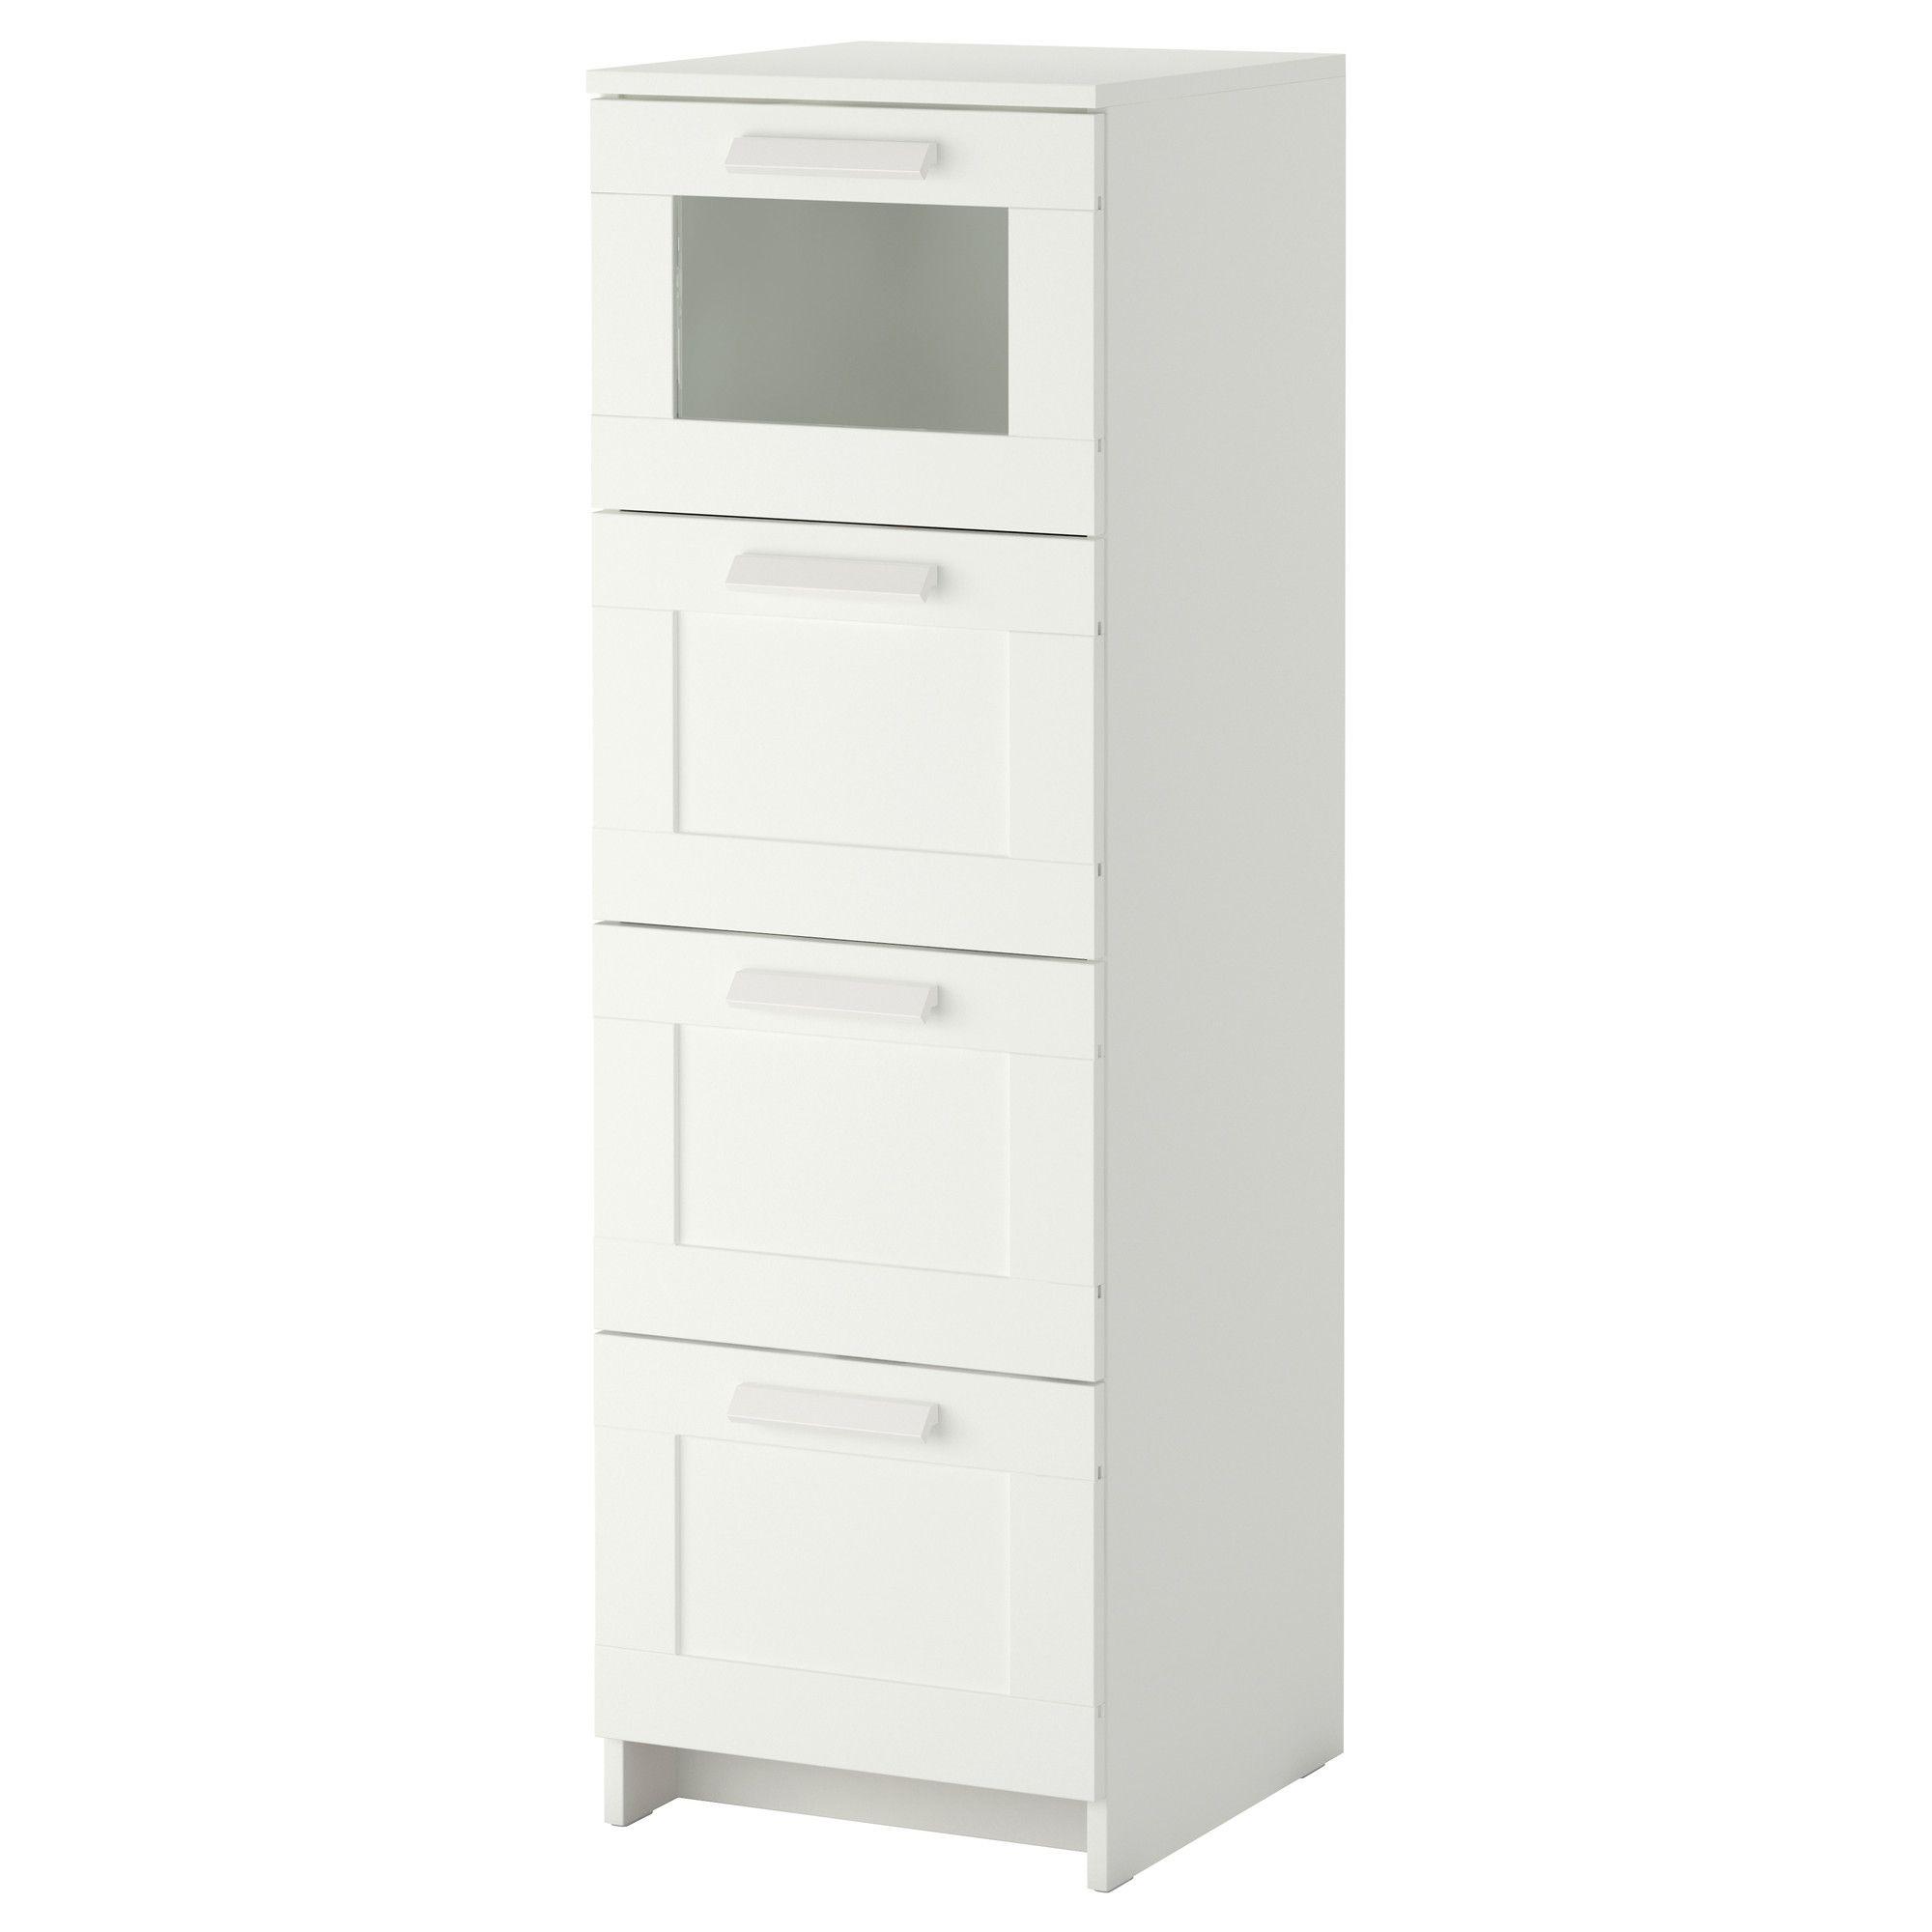 Ikea Us Furniture And Home Furnishings Brimnes Ikea Chest Of